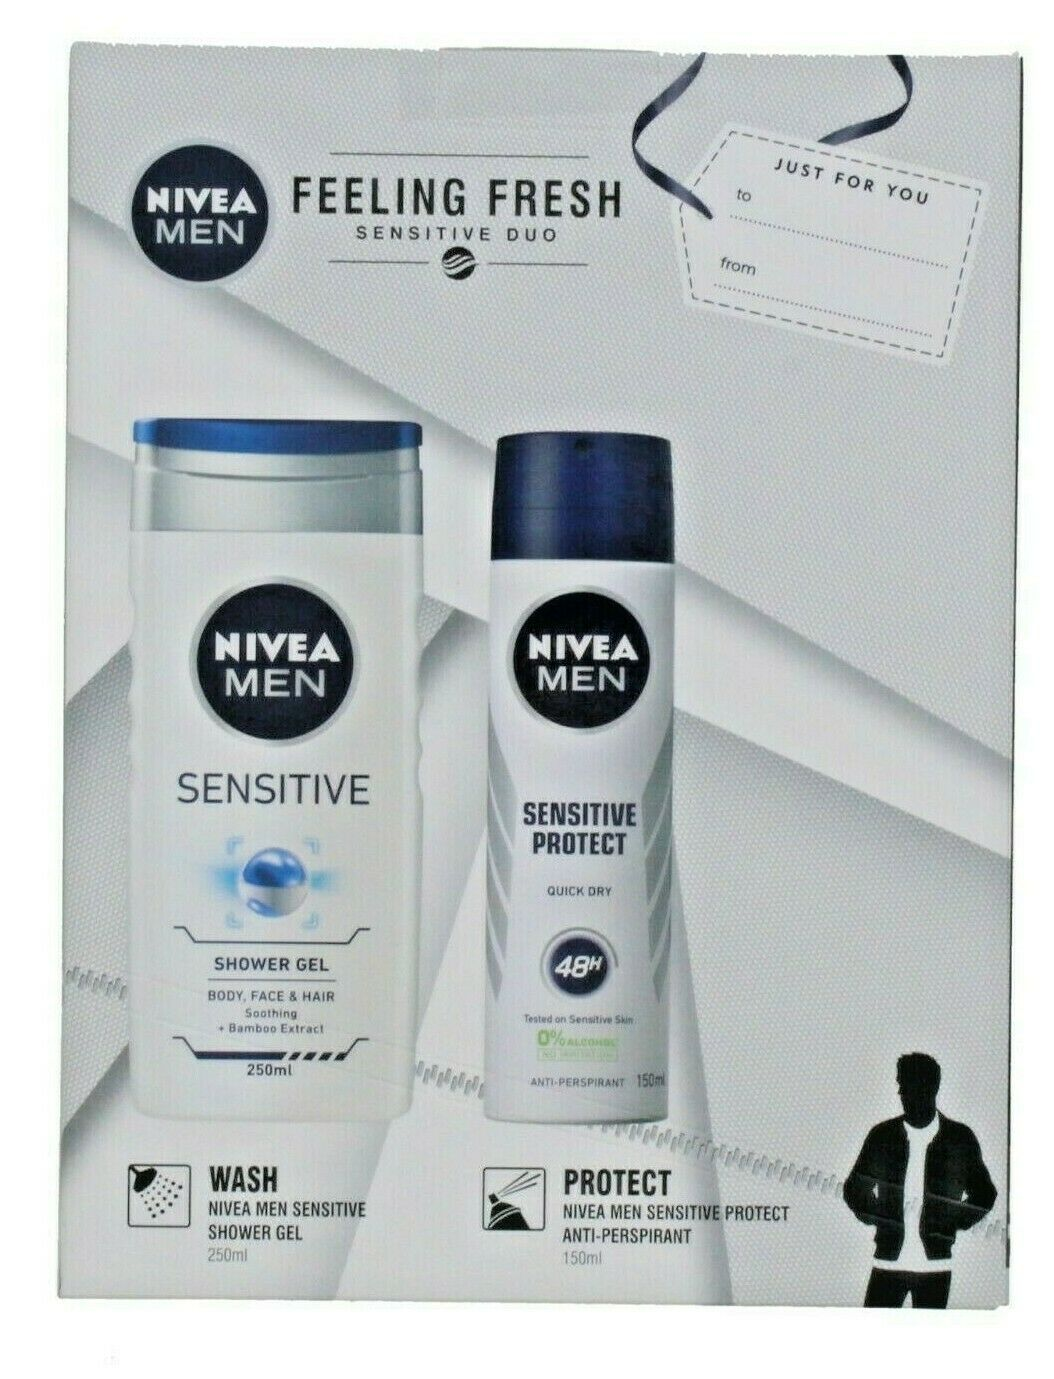 Nivea Men Feeling Fresh Duo Gift Set - Sensitive Skin - 2 Full Size Products